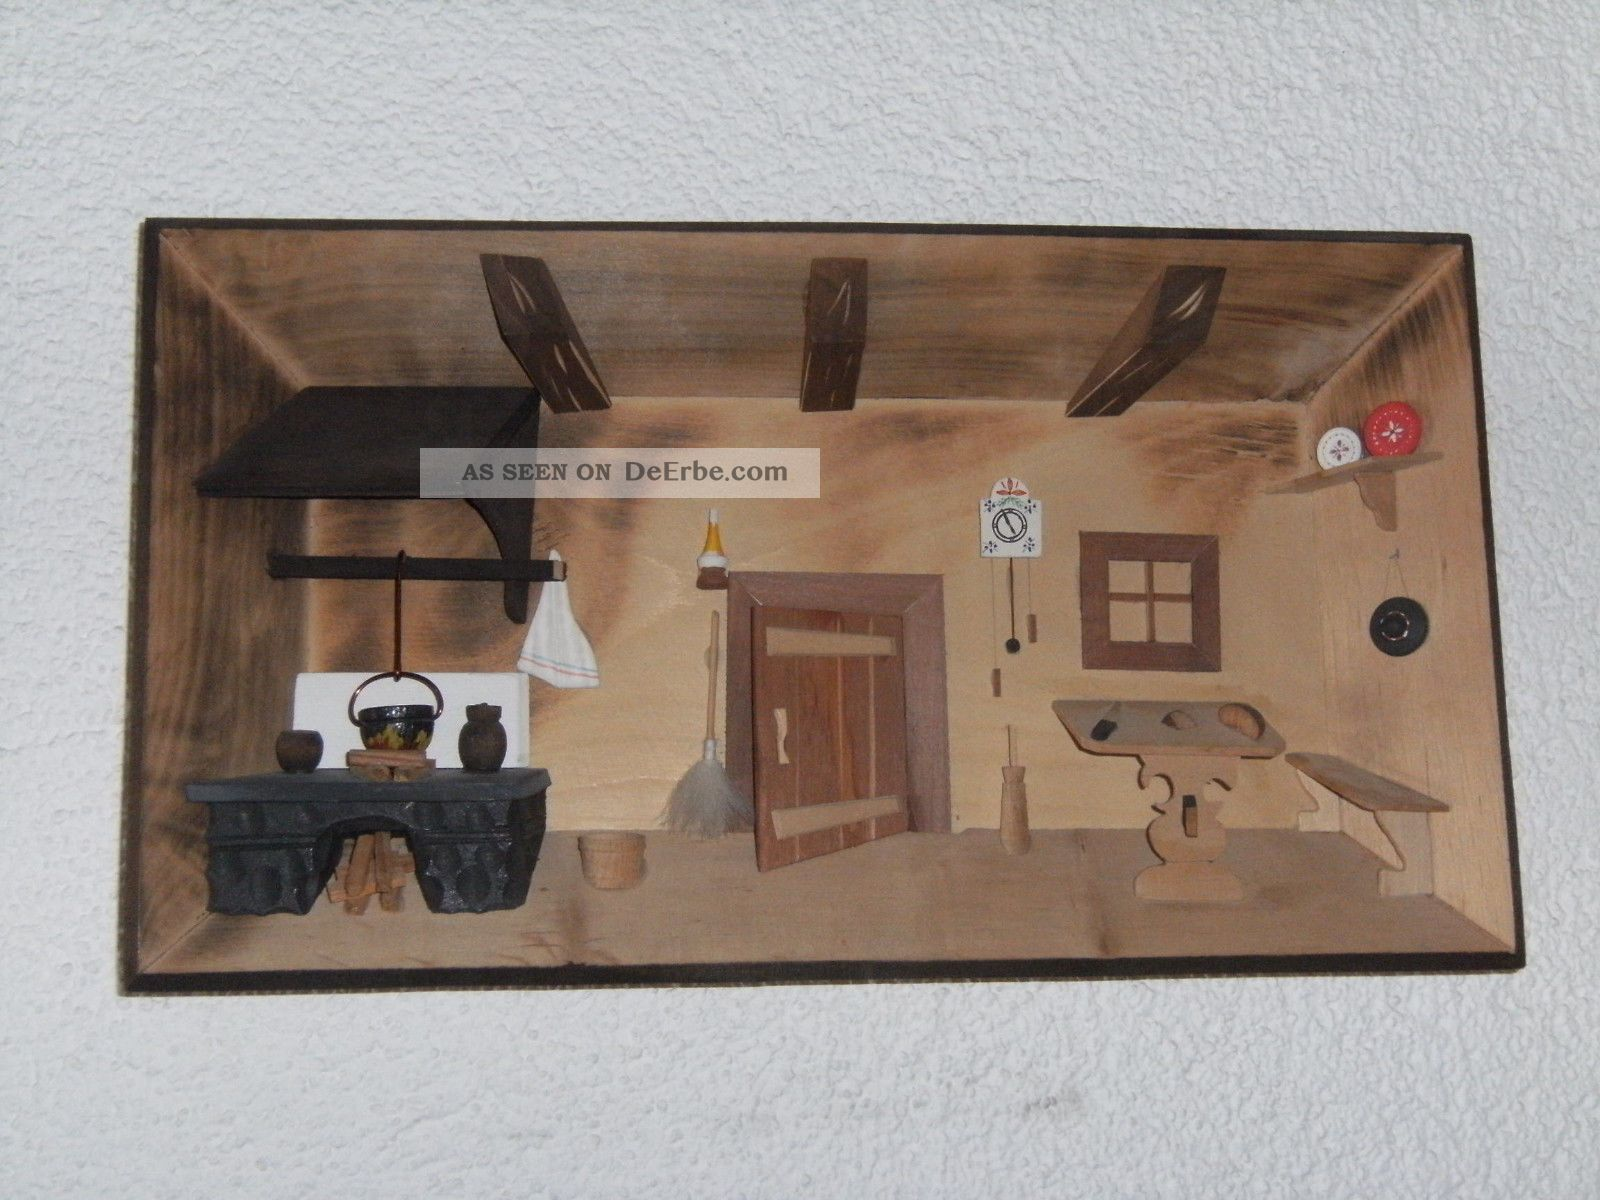 Großes Holzbild 29cm X 22cm 3d Wandbild Bauernstube Stube Folklore Holzarbeiten Bild